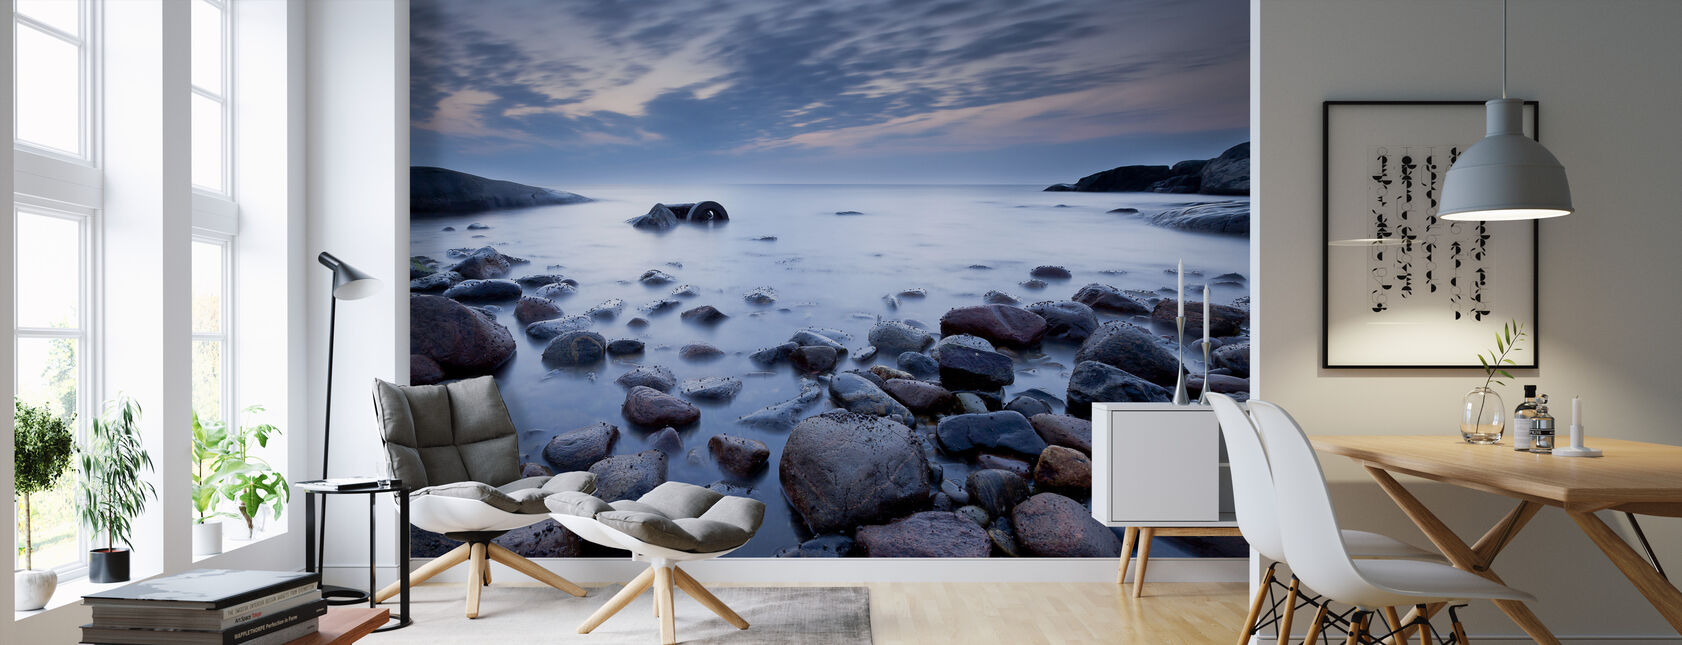 Mystic Ocean - Wallpaper - Living Room